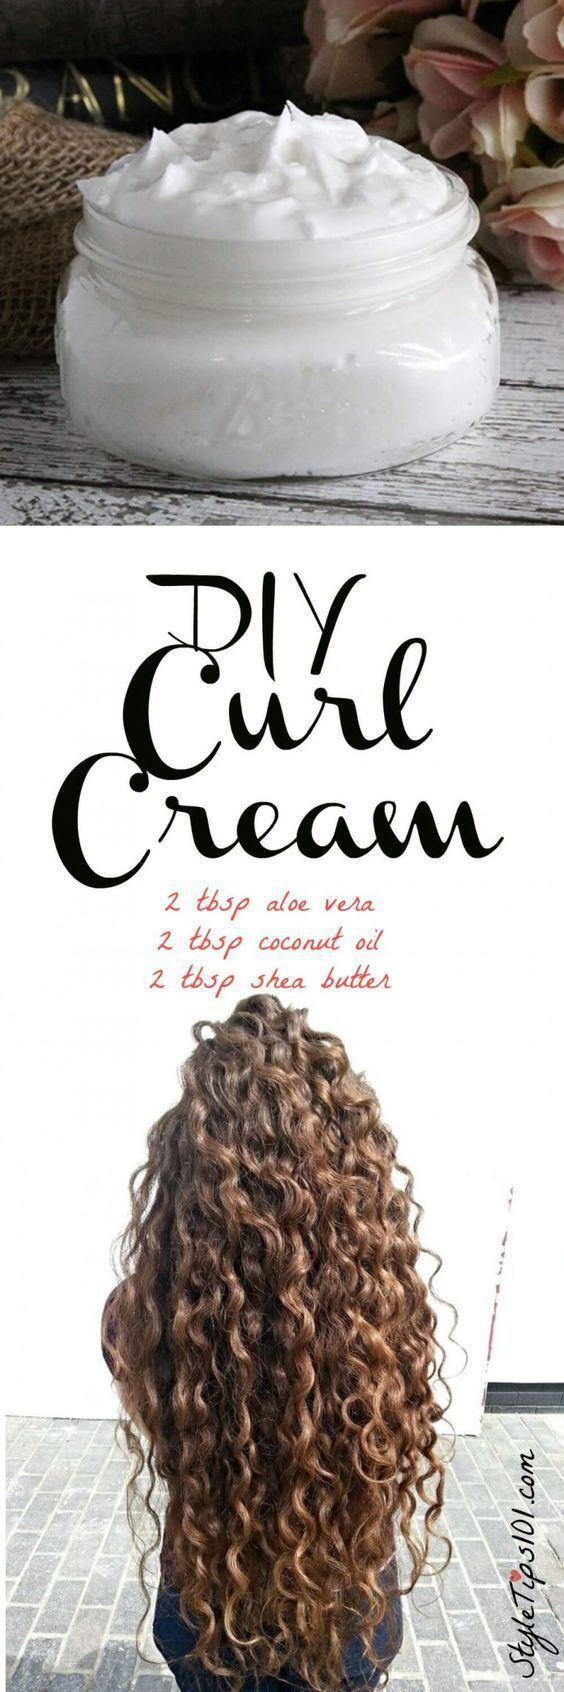 We've all had good hair days and bad hair days. Lately, I've...